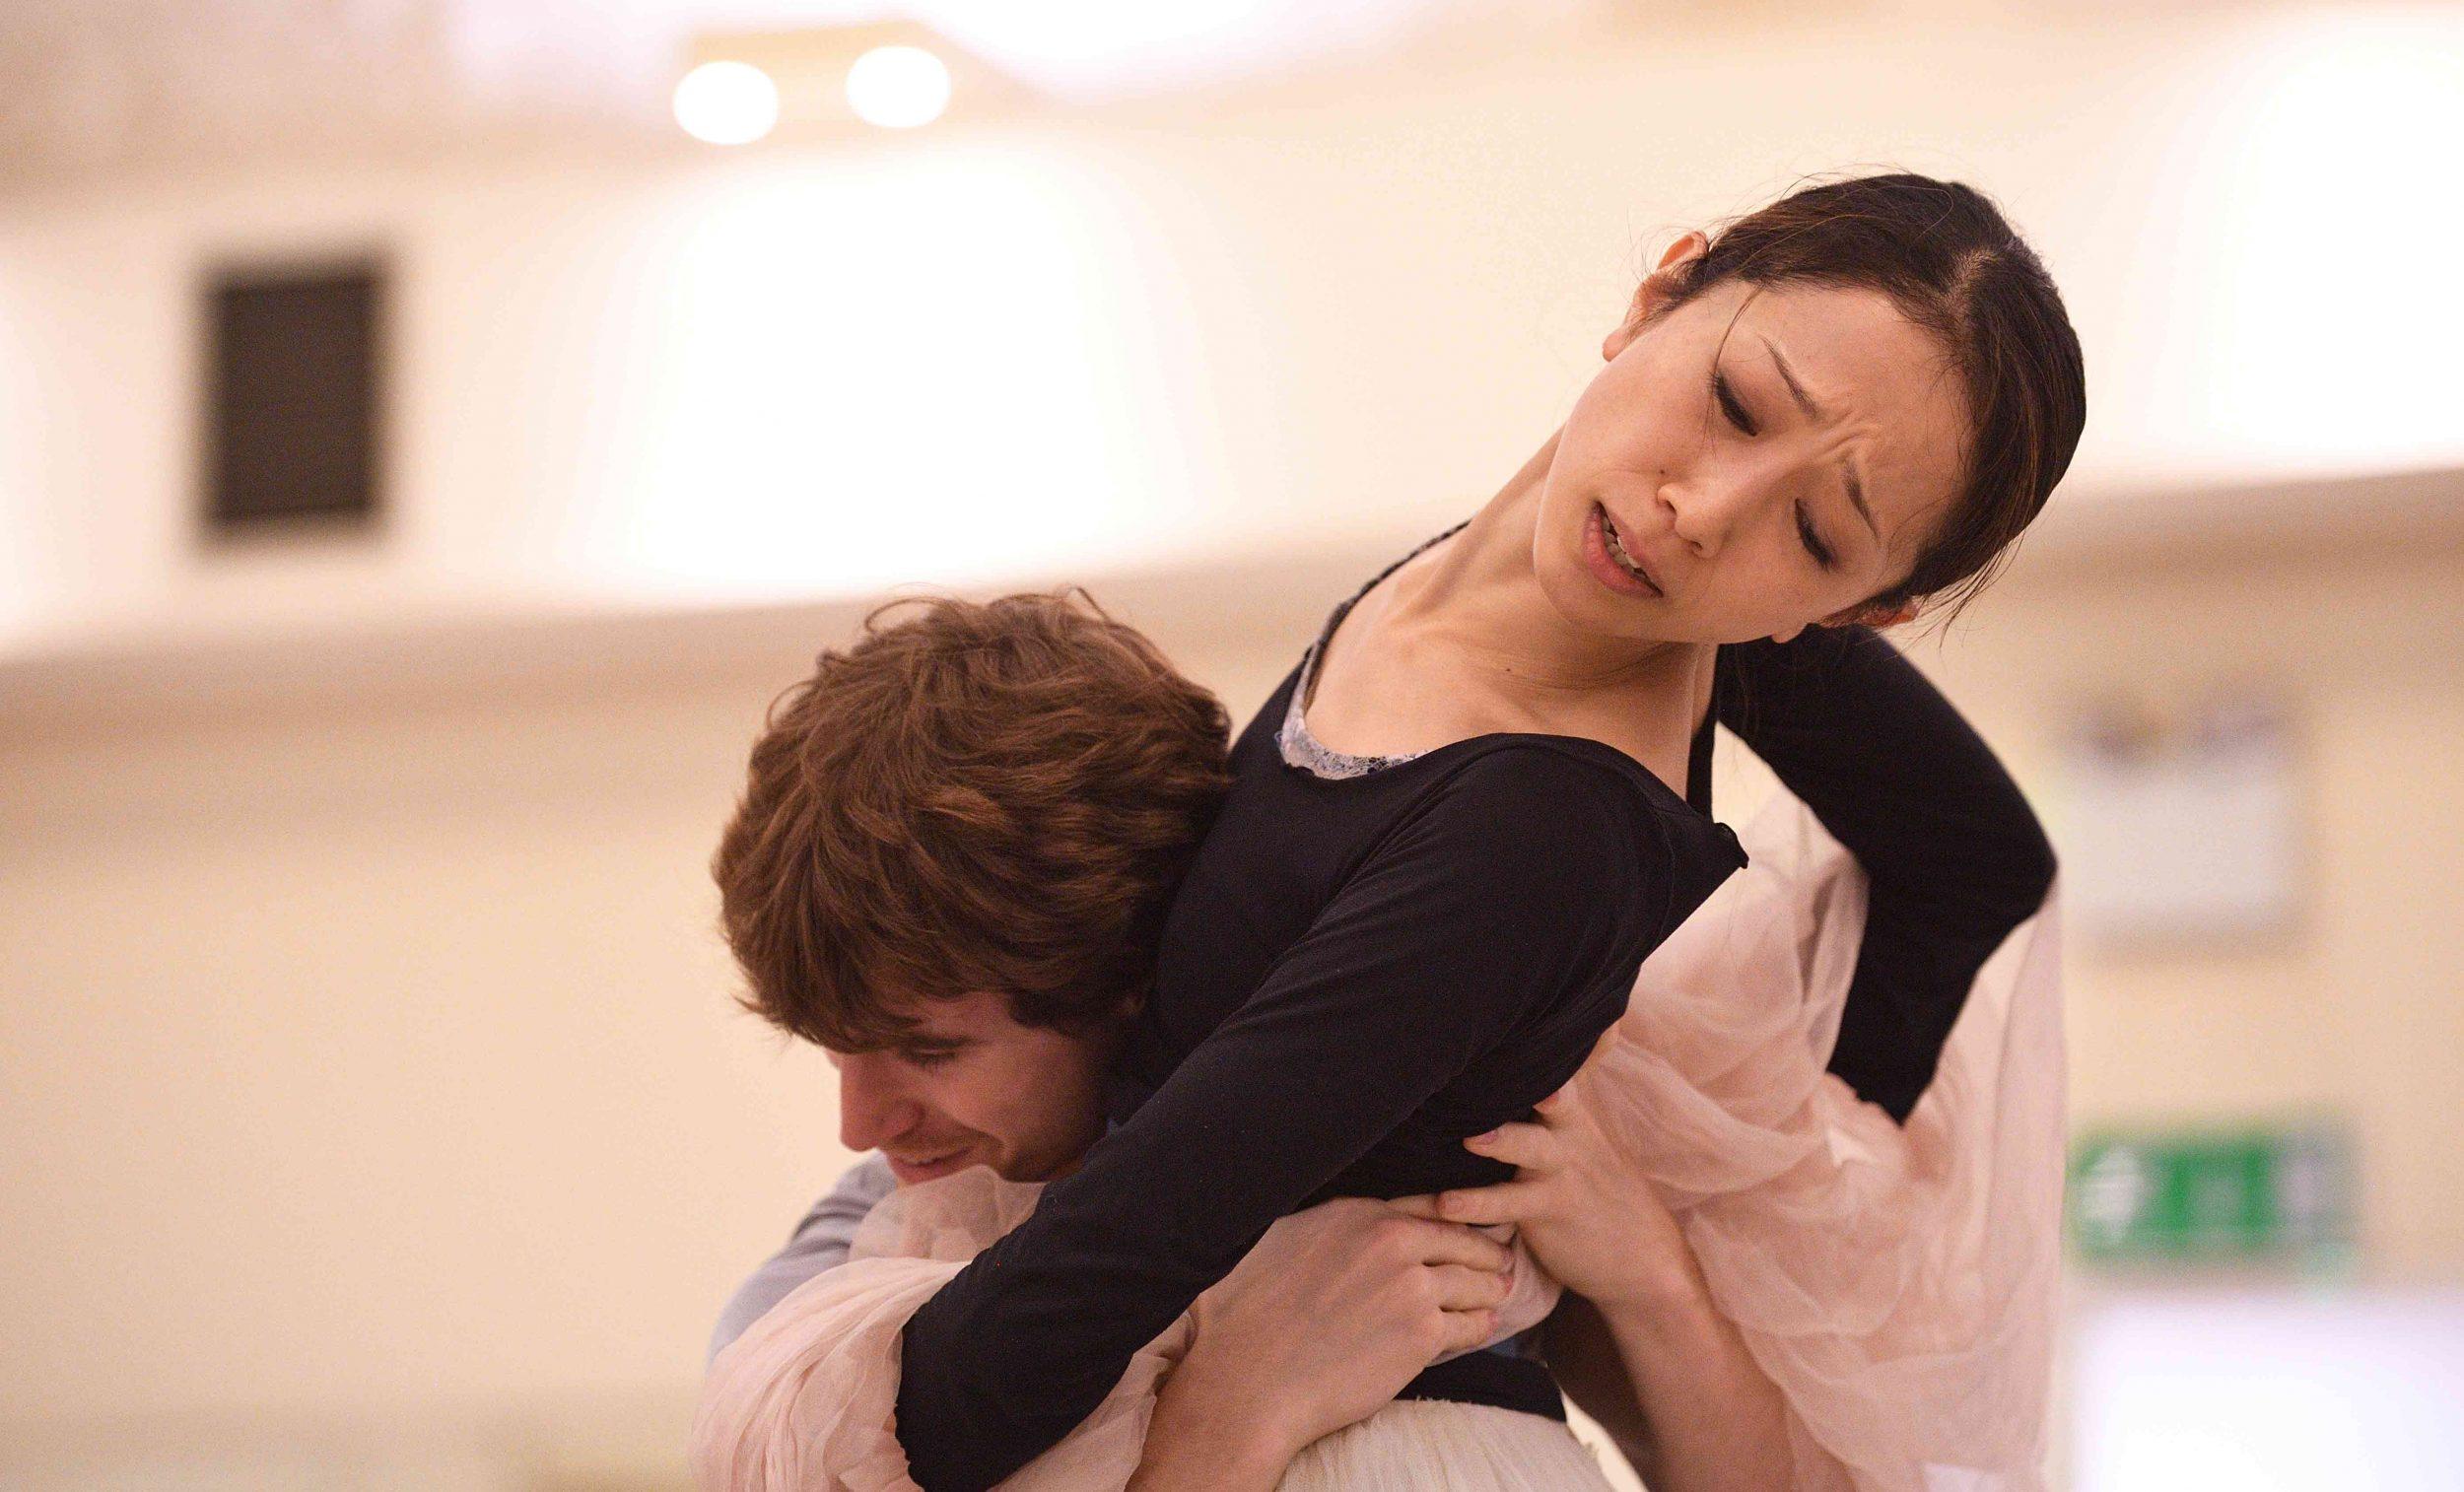 Erina-Takahashi-and-Aitor-Arrieta-rehearsing-La-Sylphide-©-Laurent-Liotardo-(1)